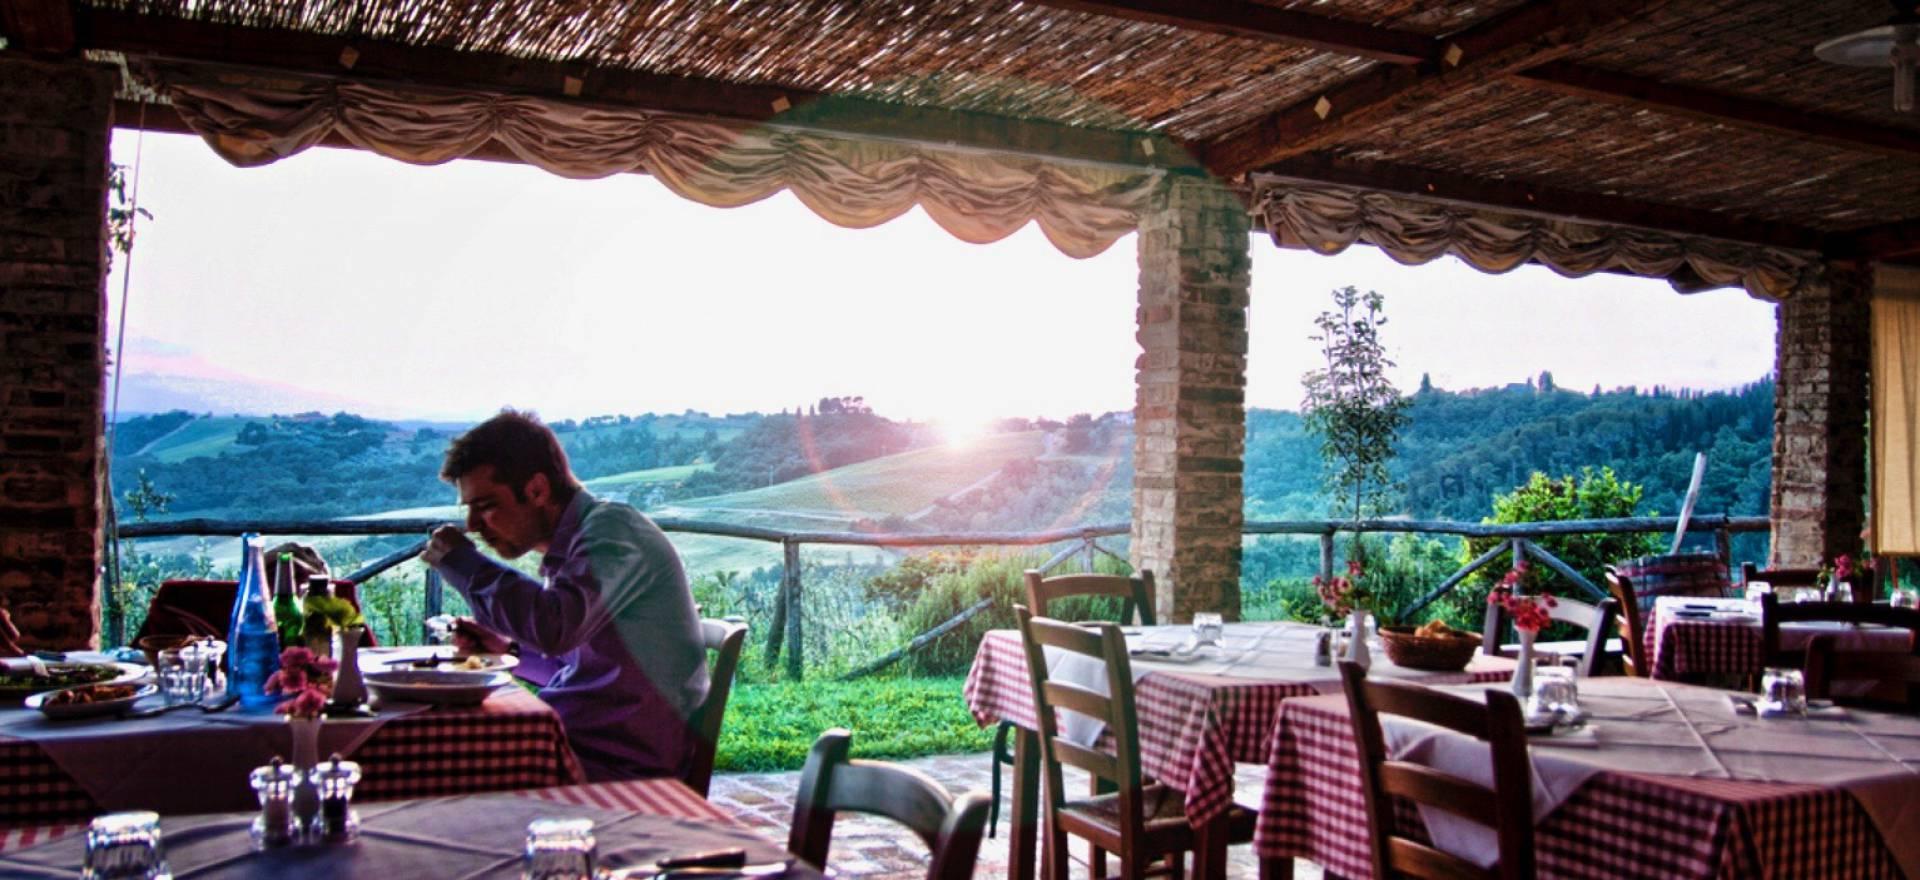 Agriturismo Toscana Agriturismo Toscana, ottimo per bambini con ristorante